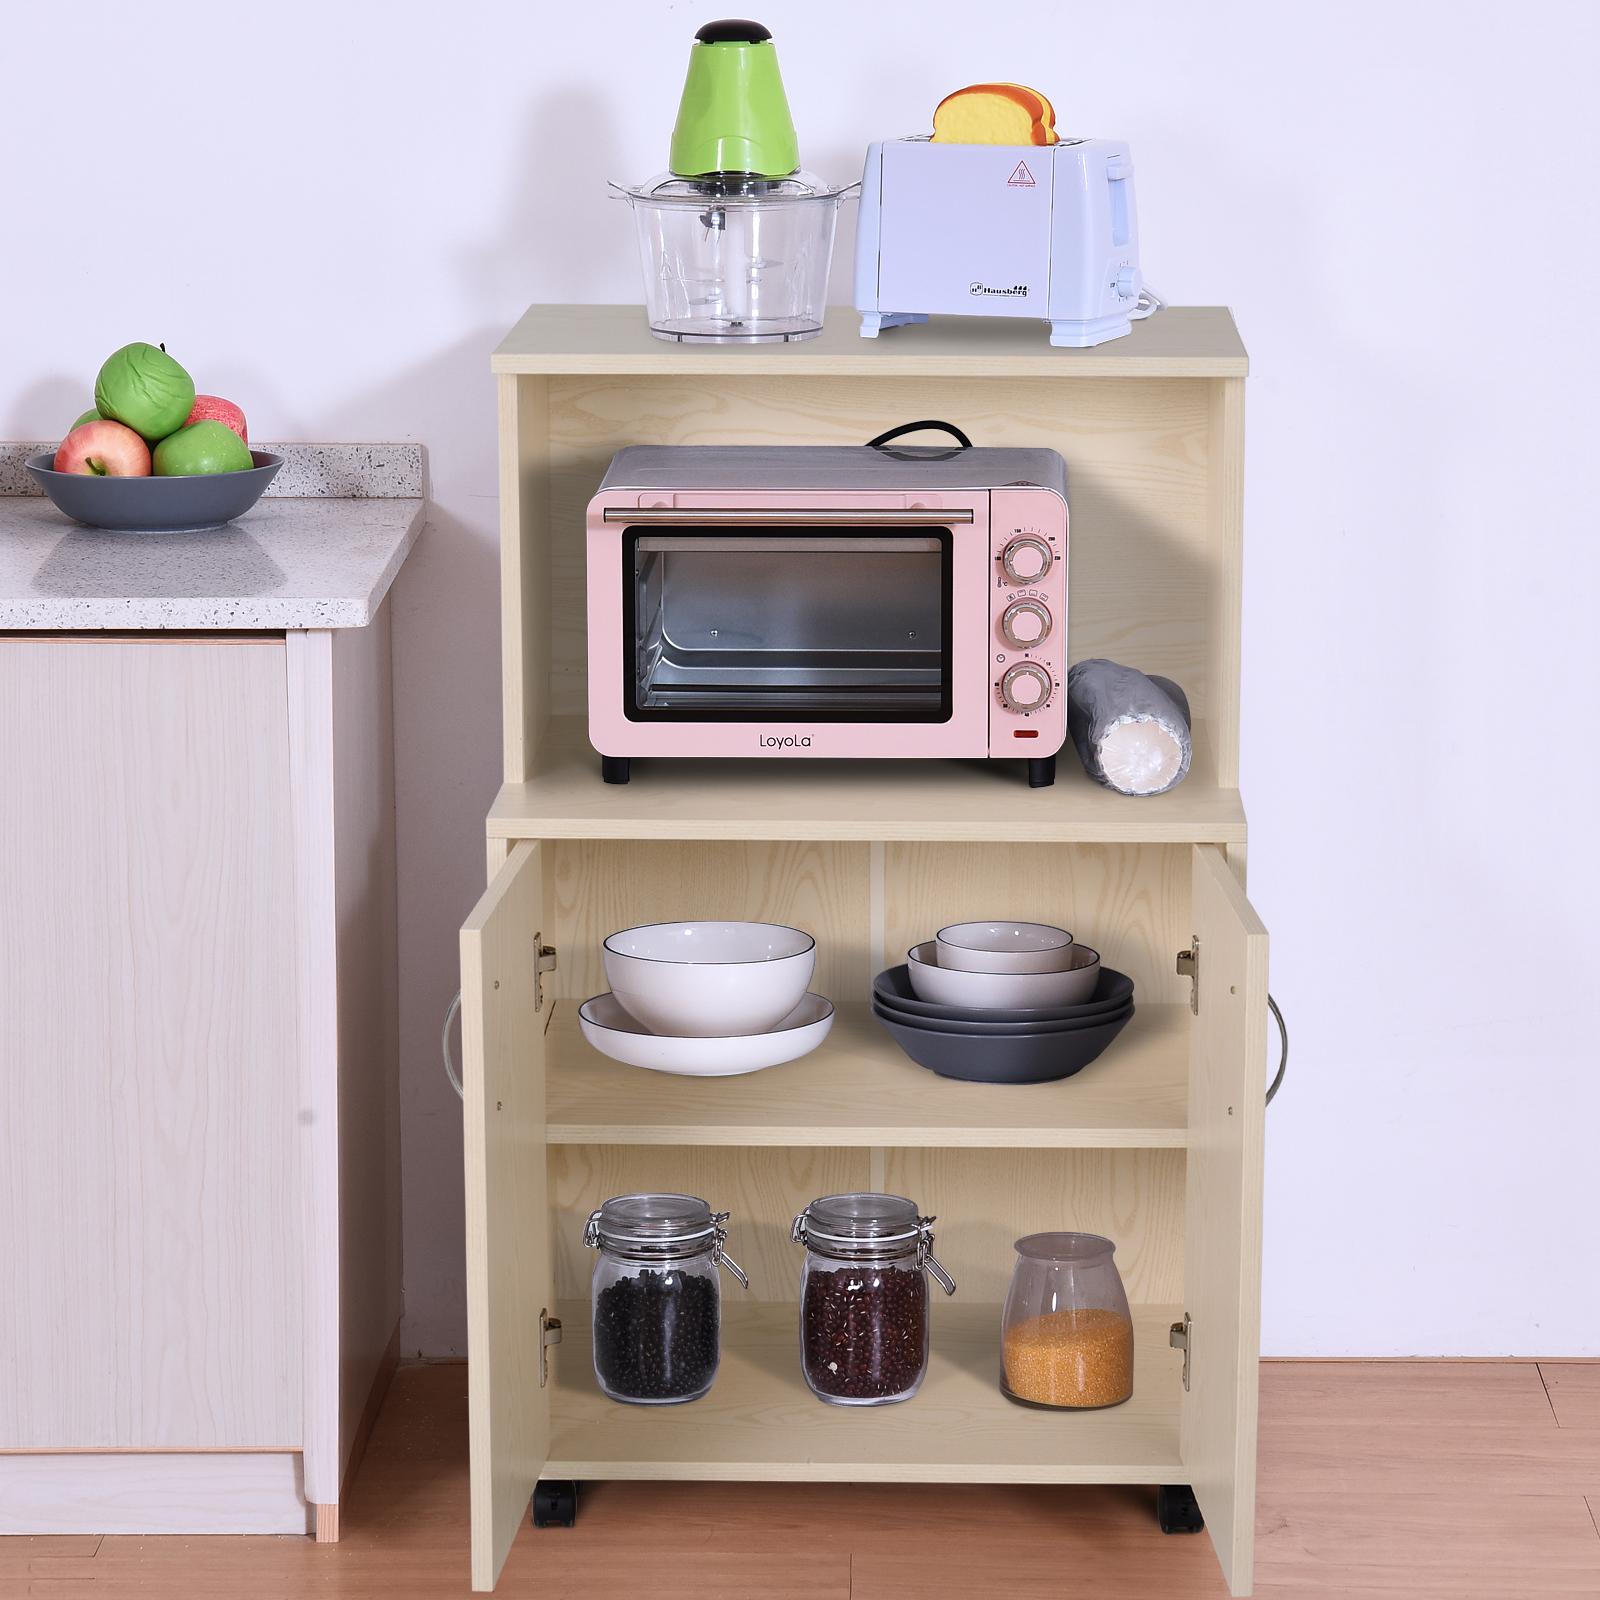 HOMCOM Rolling Kitchen Trolley Microwave Cart 2-Door Cabinet Storage Shelves w//Wheels Oak